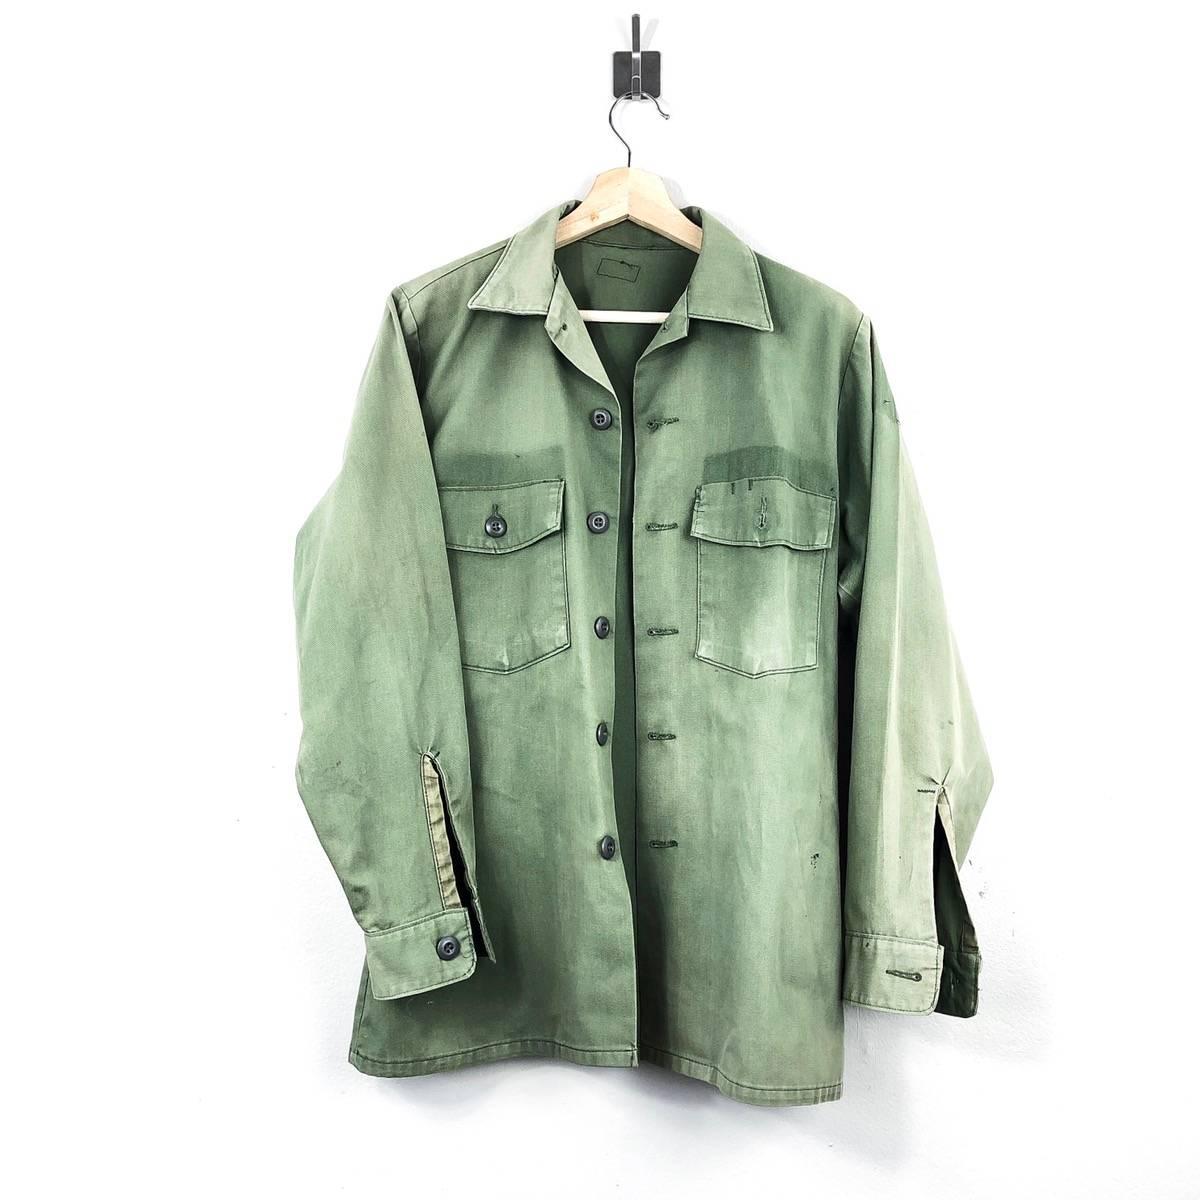 0efb8744b795 Olive Green Military Shirt Mens « Alzheimer's Network of Oregon